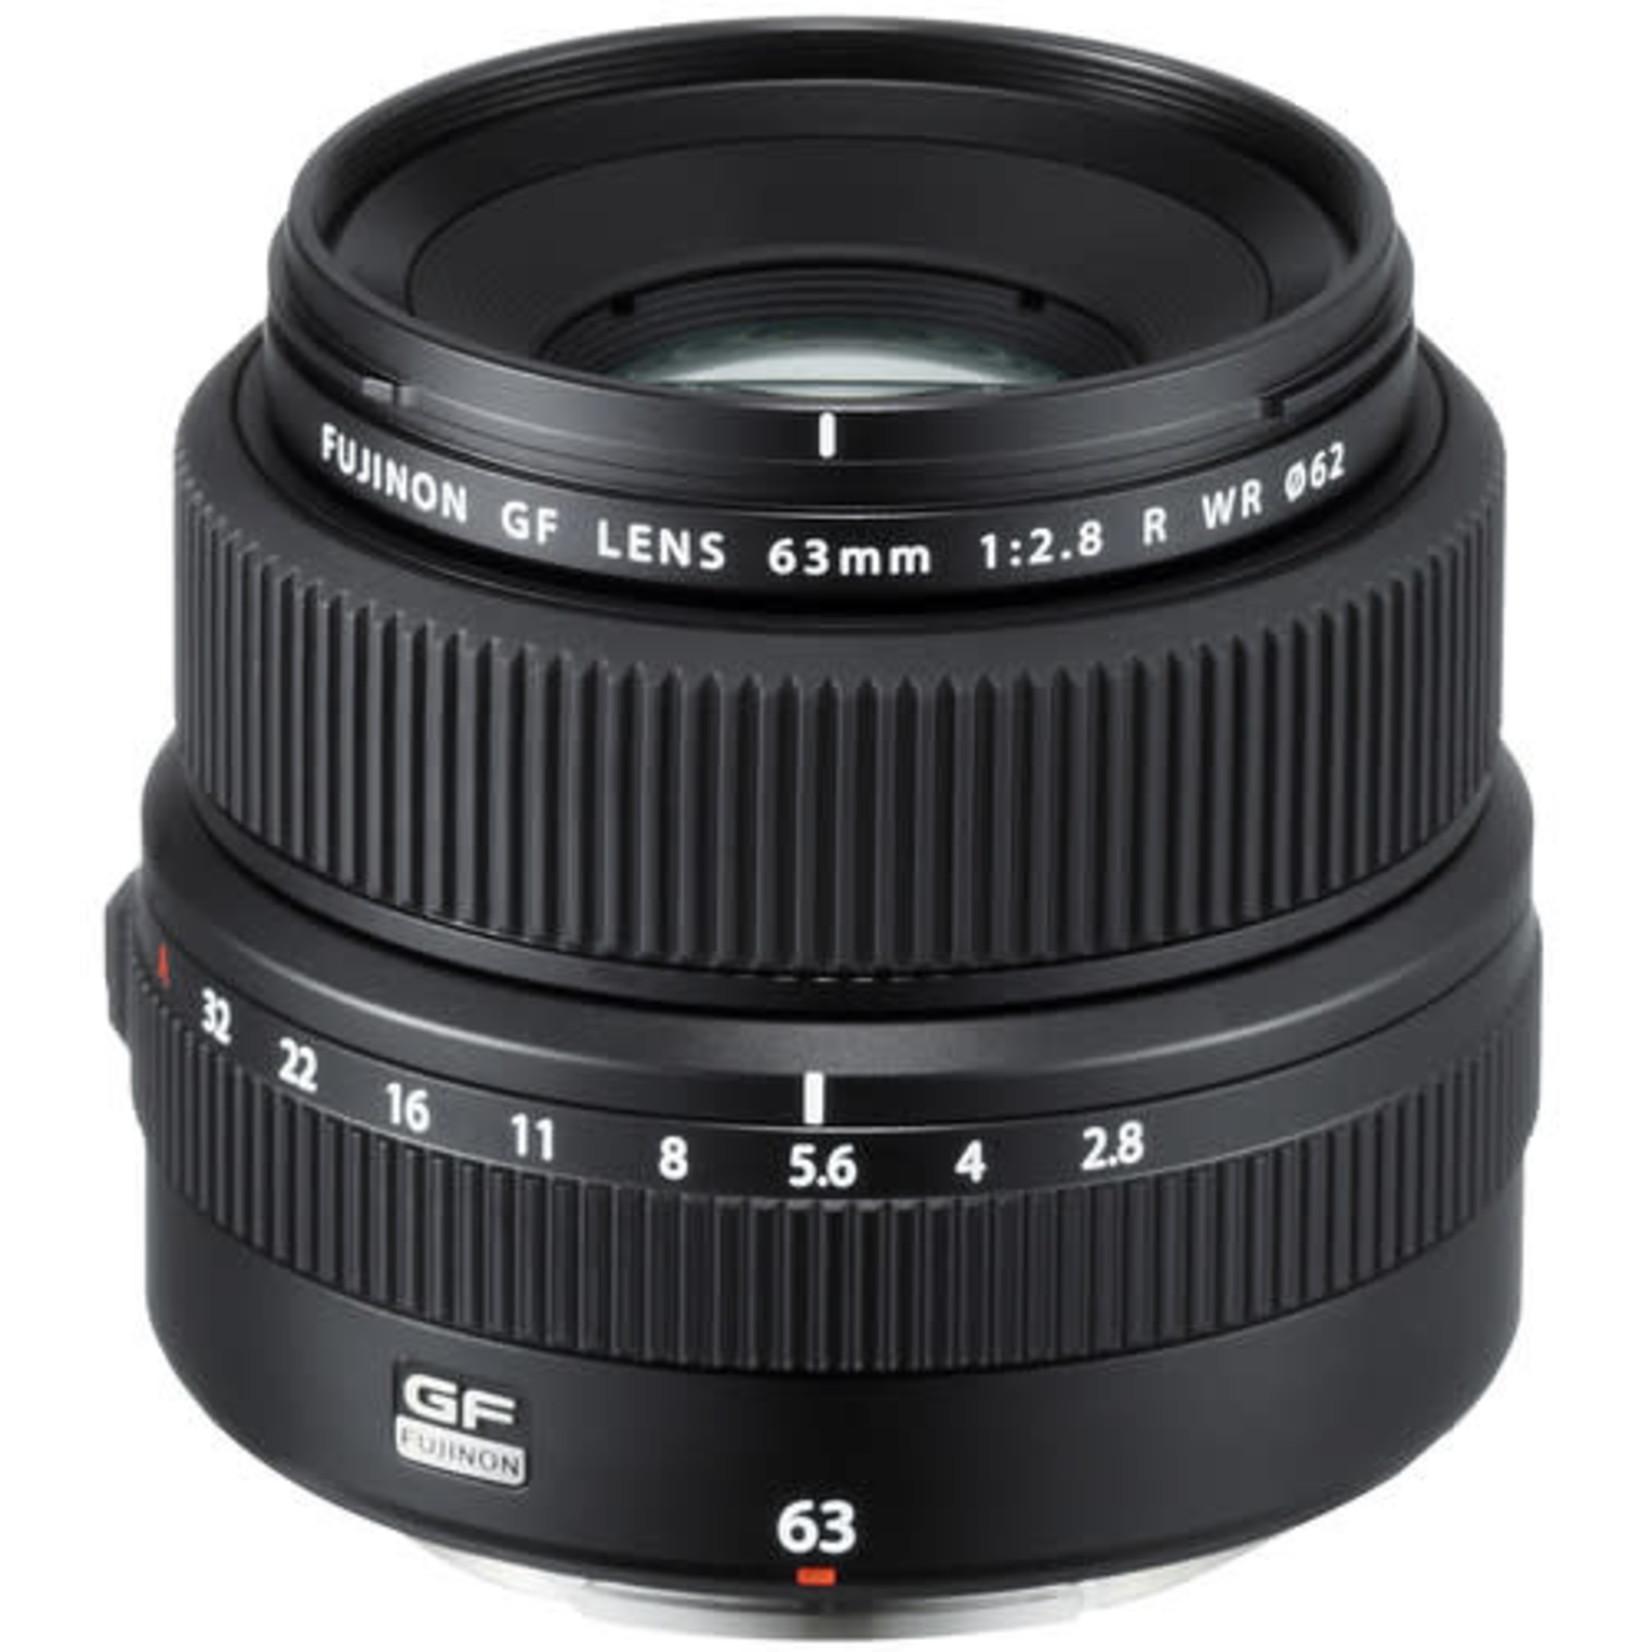 FujiFilm FUJIFILM GF 63mm f/2.8 R WR Lens